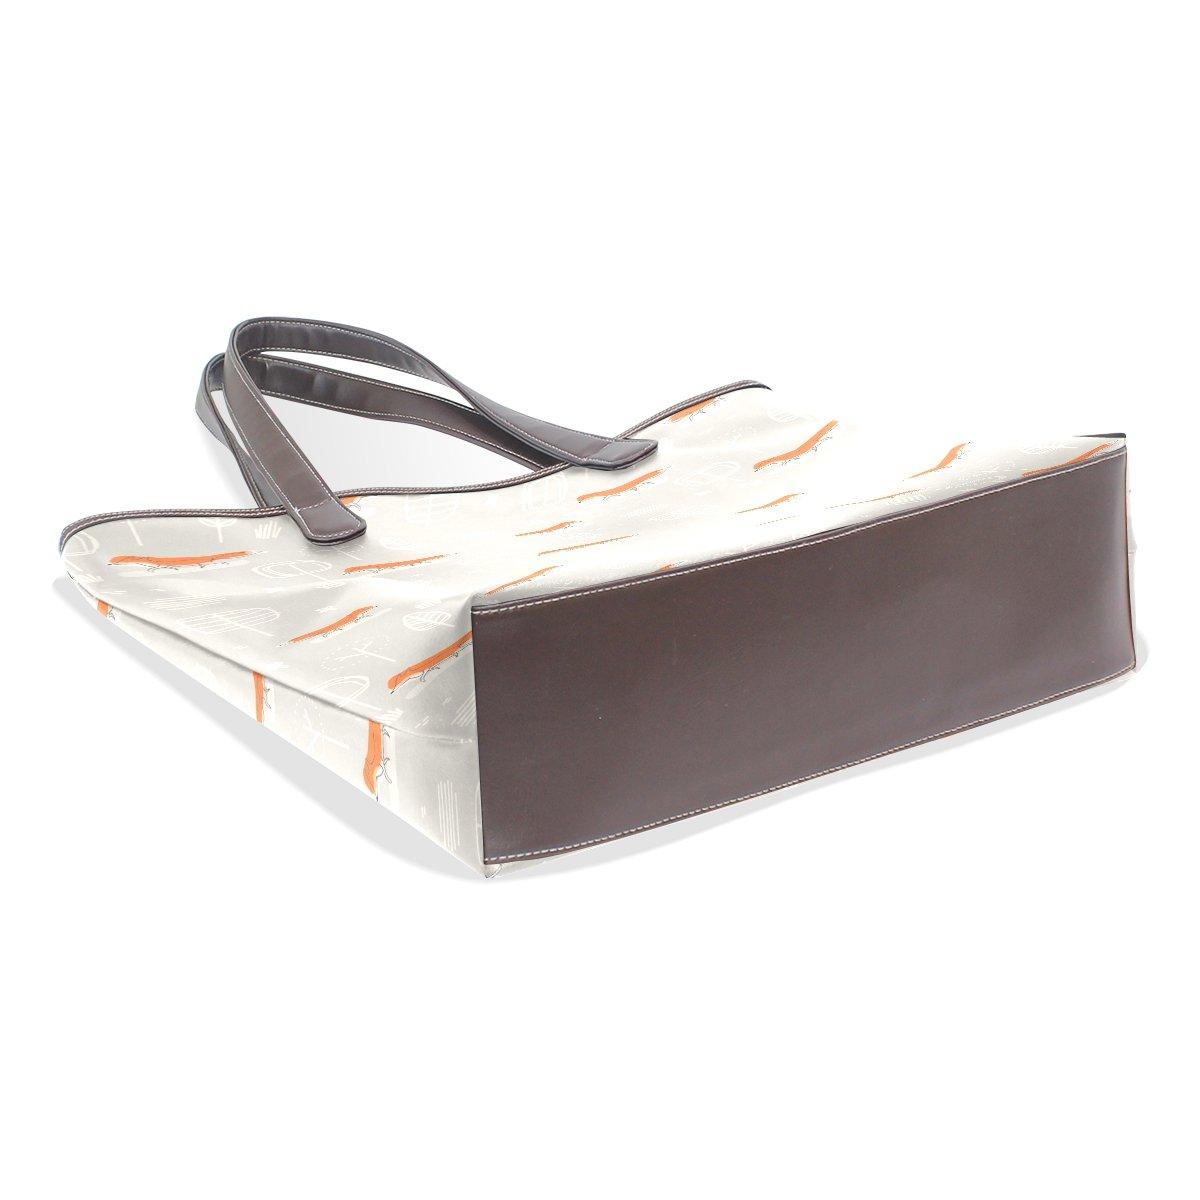 SCDS Group Of Fox PU Leather Lady Handbag Tote Bag Zipper Shoulder Bag